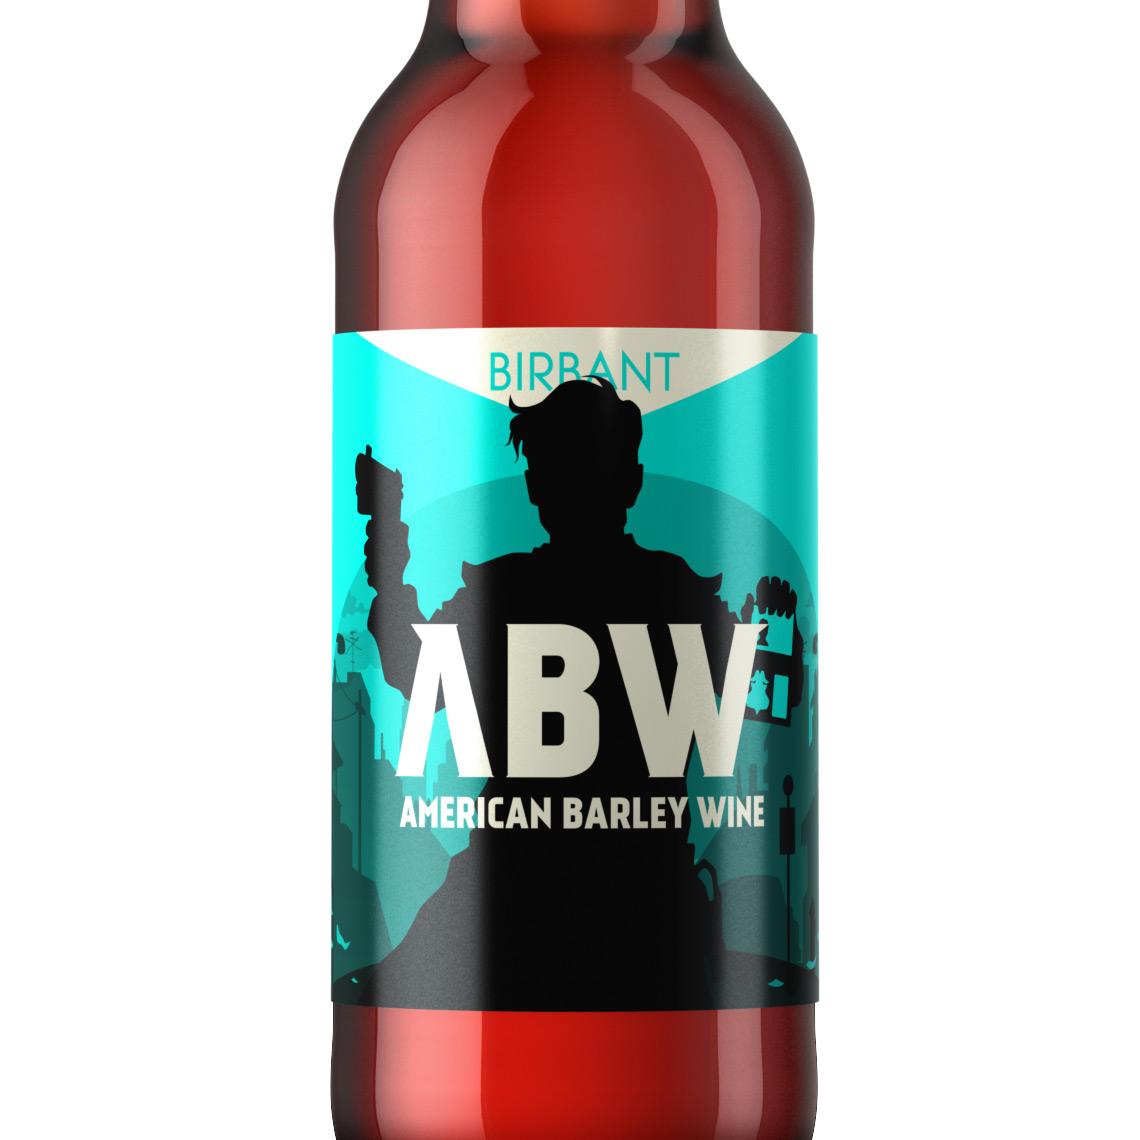 Birbant American Barley Wine